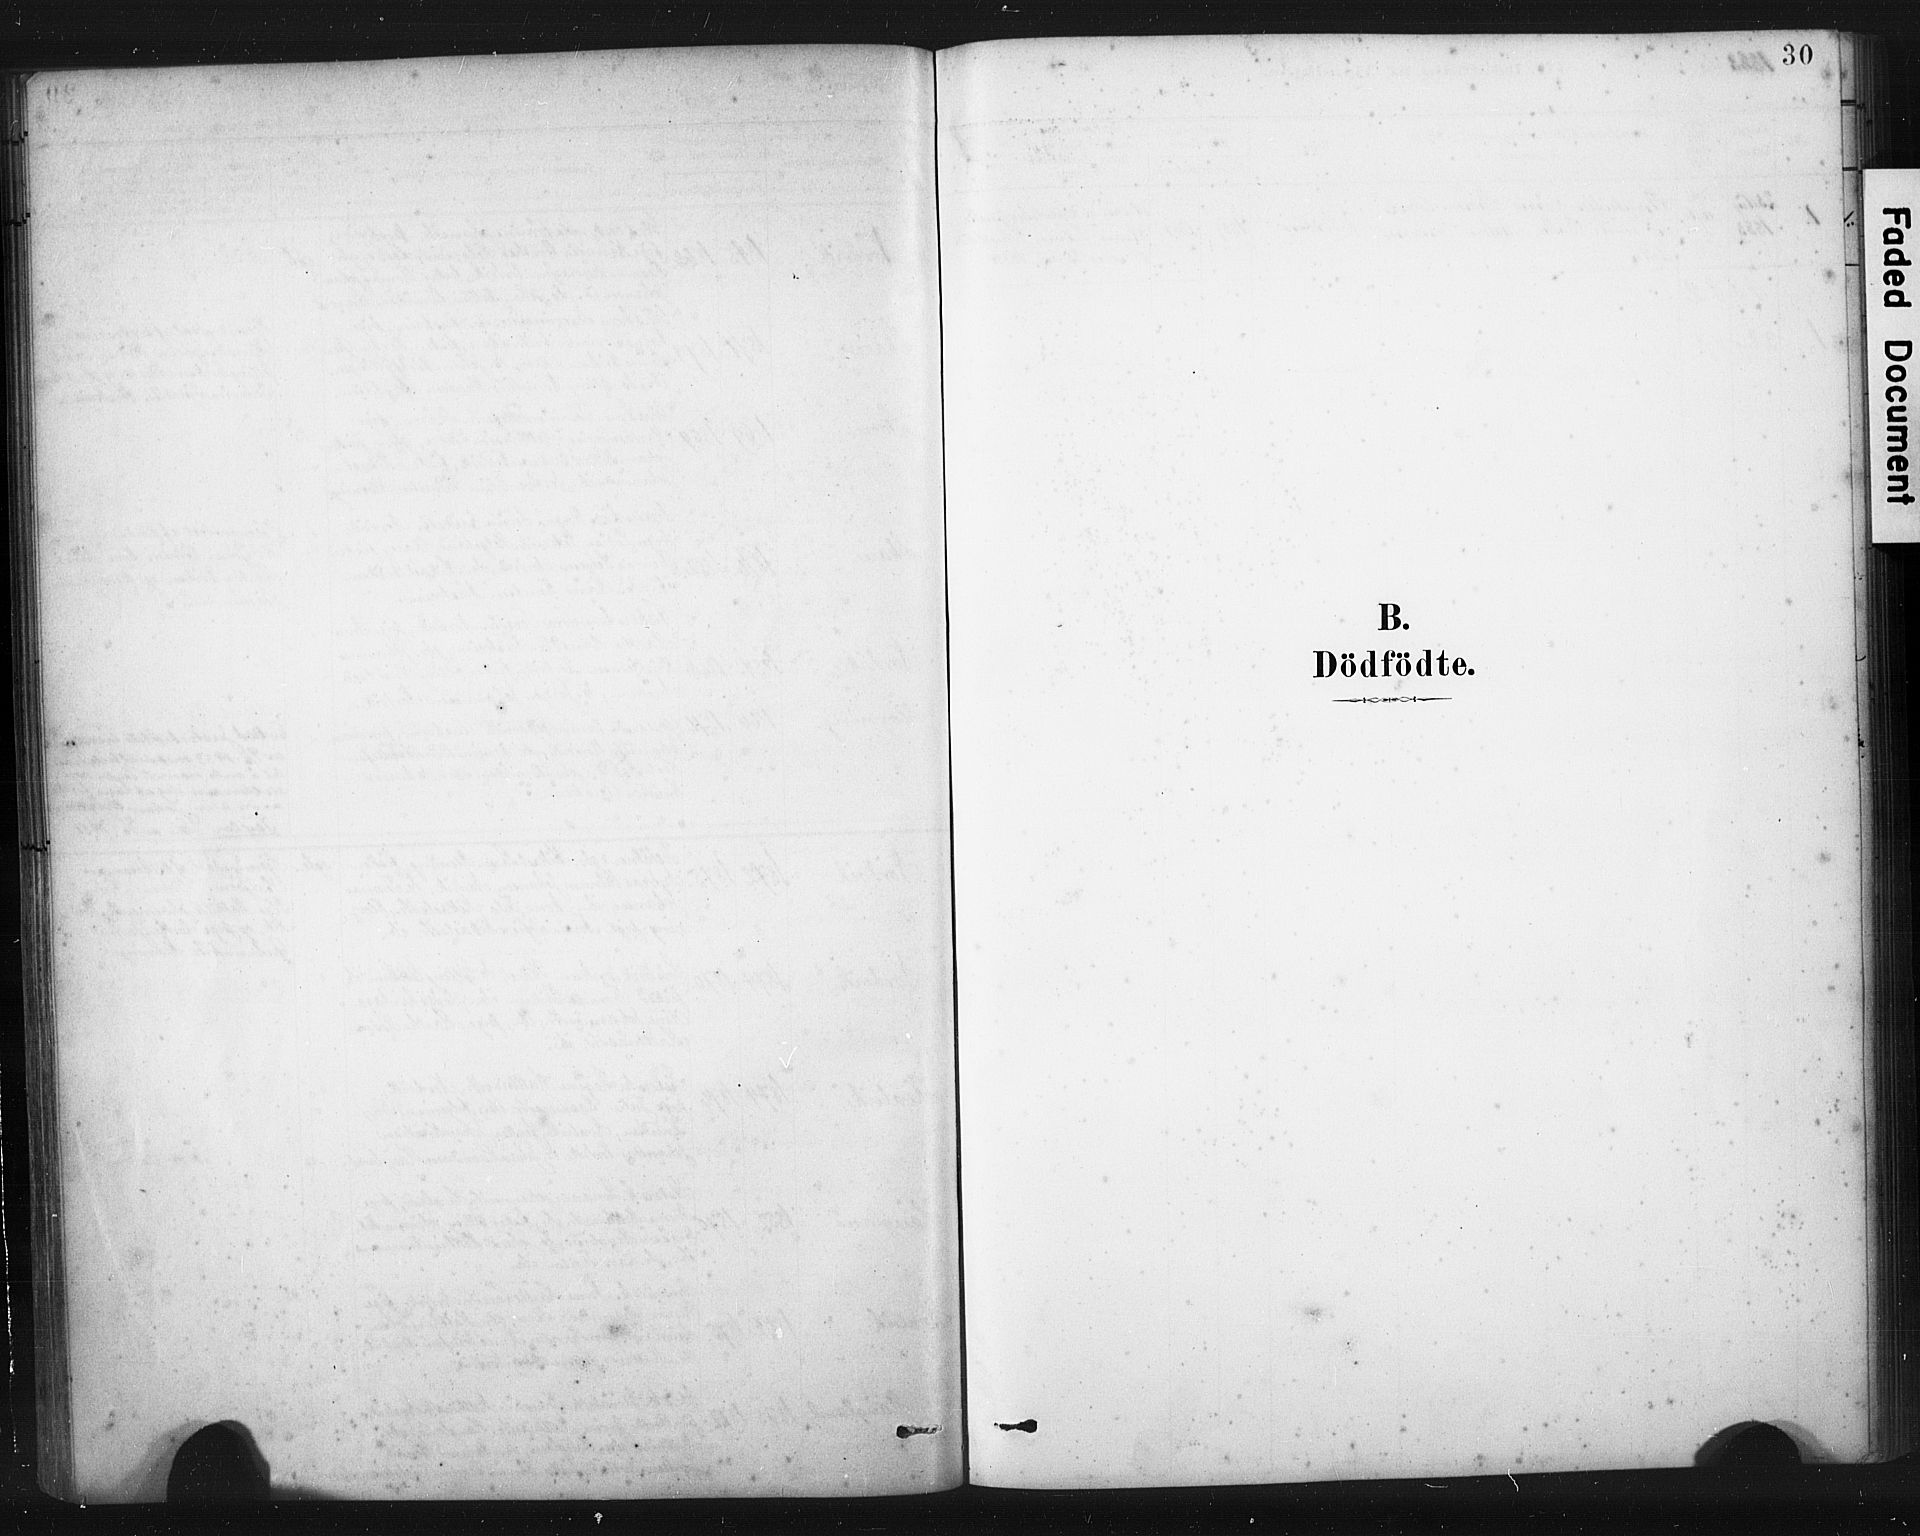 SAST, Torvastad sokneprestkontor, H/Ha/Haa/L0016: Ministerialbok nr. A 15, 1883-1903, s. 30